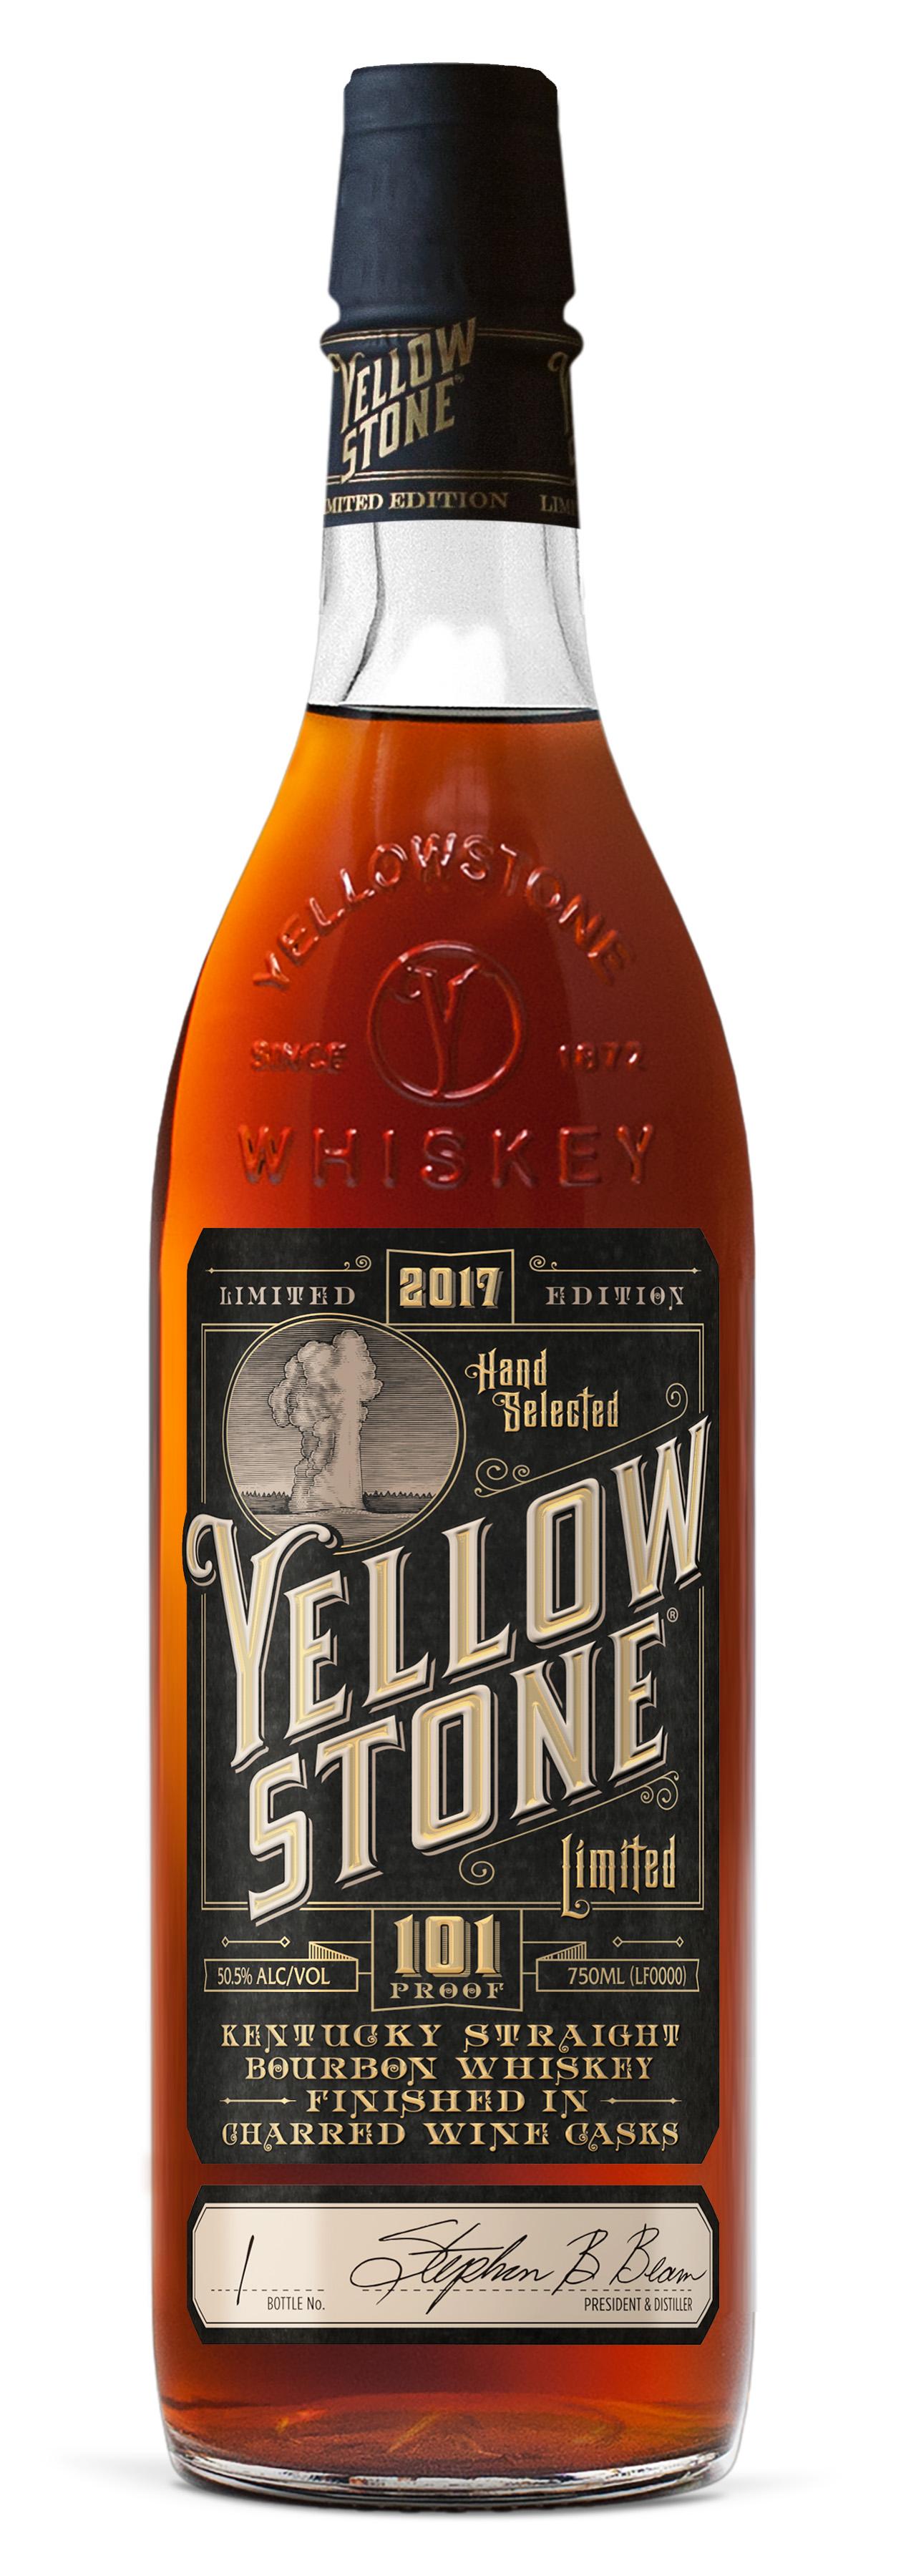 Yellowstone Limited Edition Kentucky Straight Bourbon 2017